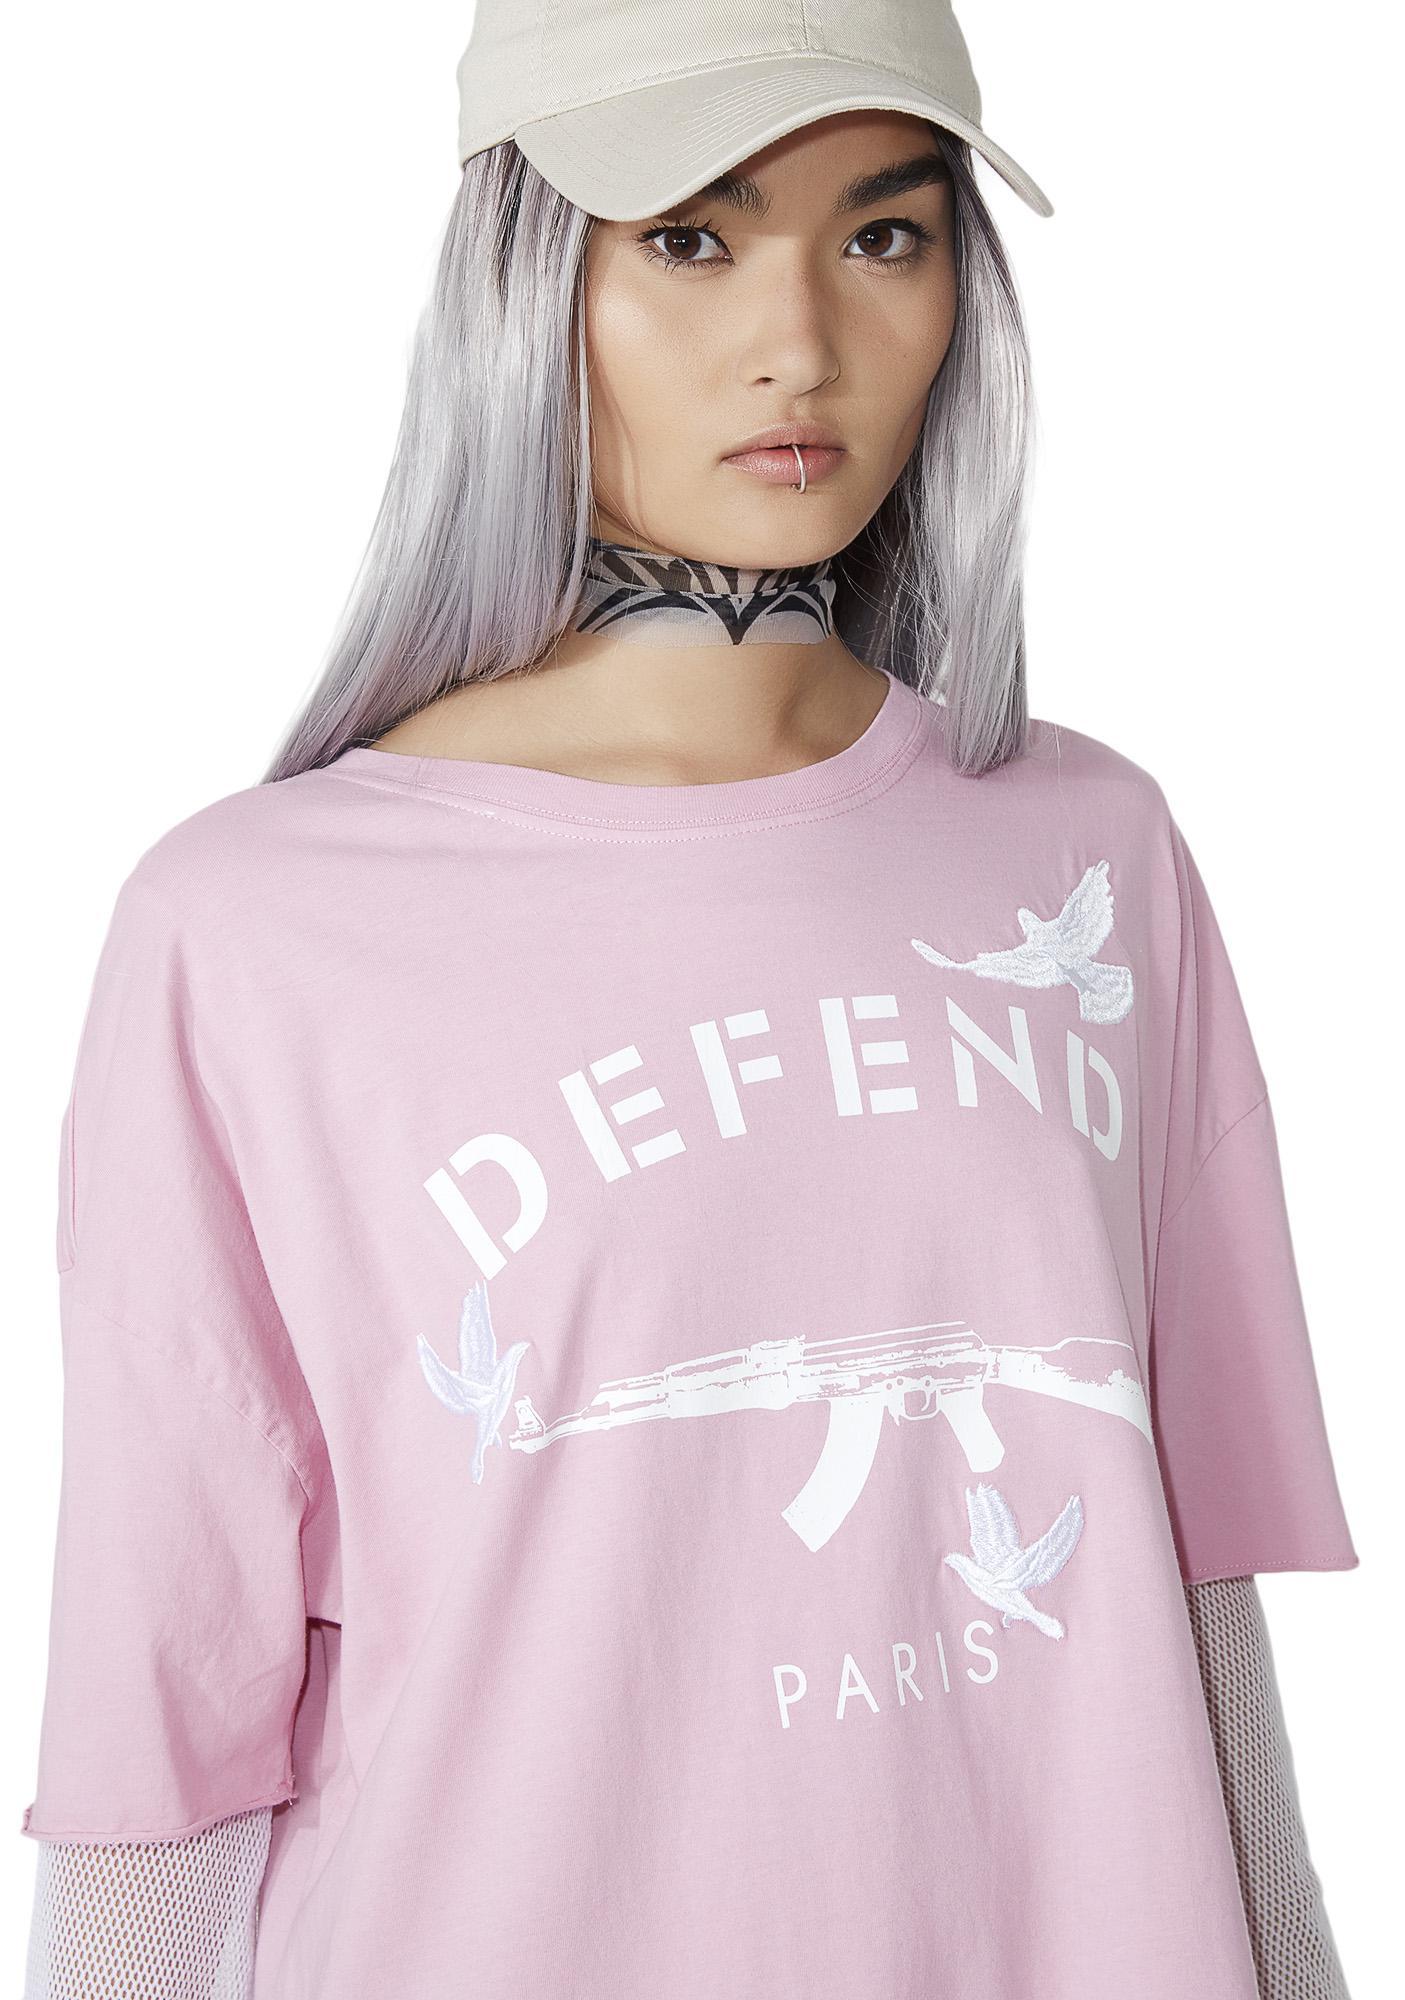 Defend Paris Faustin Tee